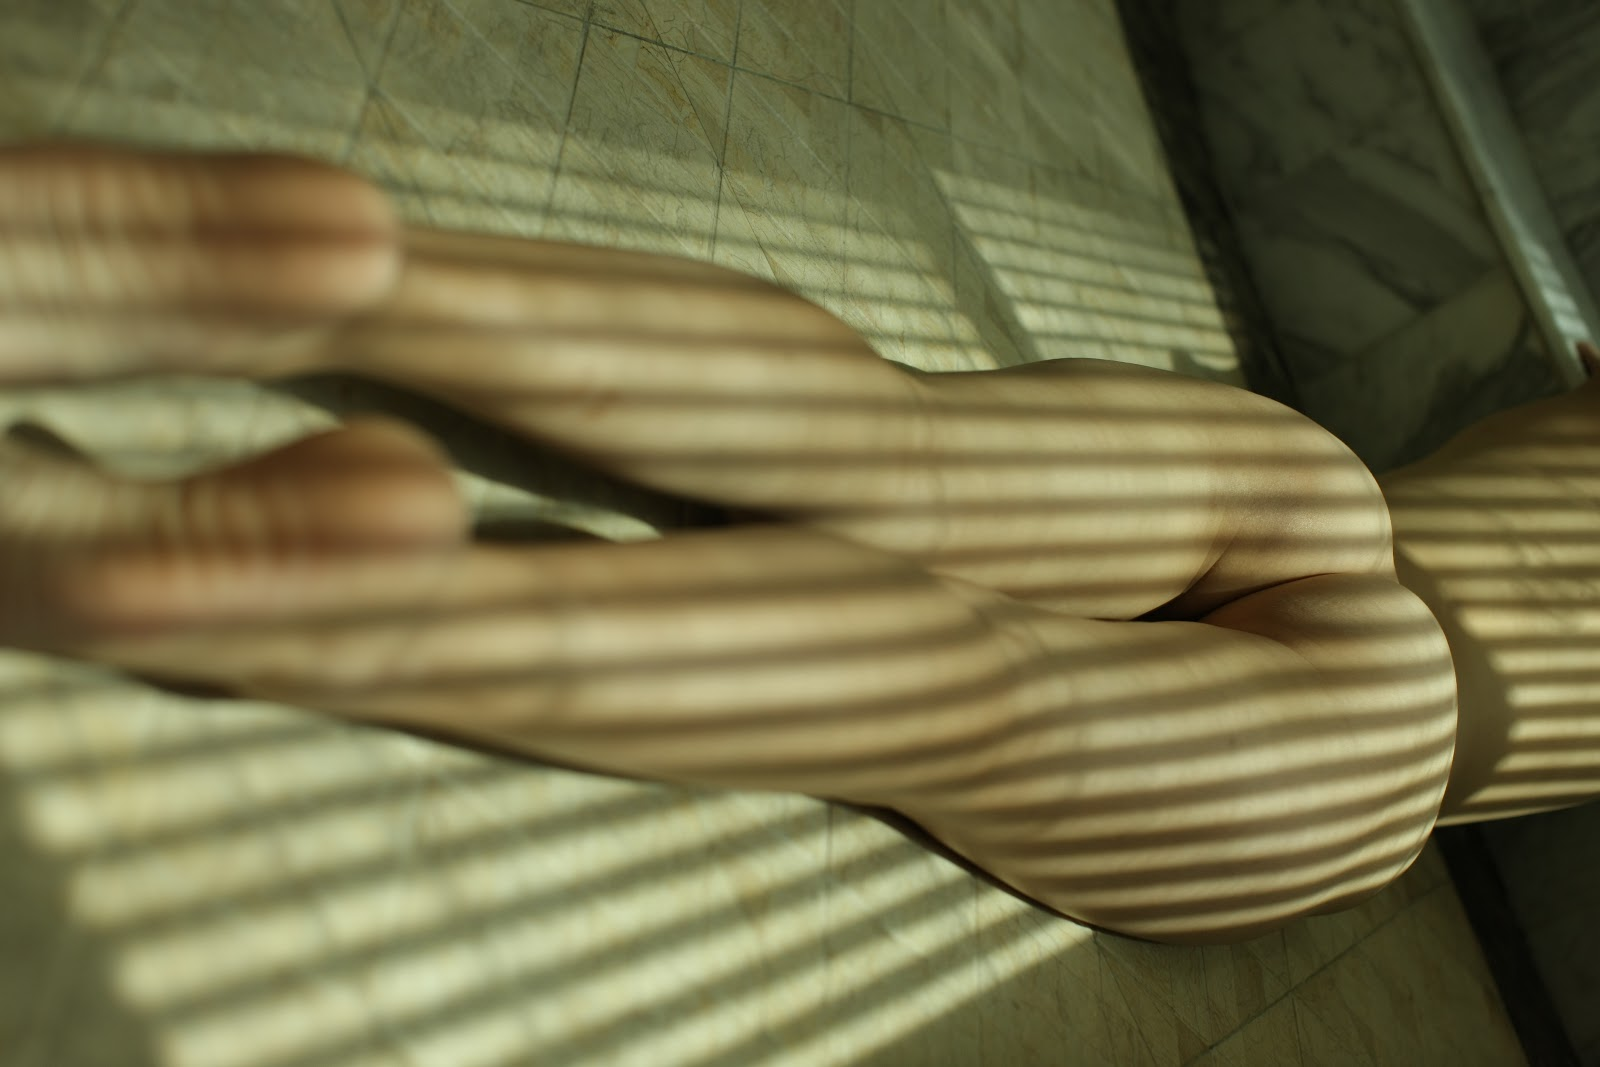 Chinese Nude_Art_Photos_-_203_-_XiangXiang_Vol_3.rar Chinese_Nude_Art_Photos_-_203_-_XiangXiang_Vol_3.rar.IMG_0306